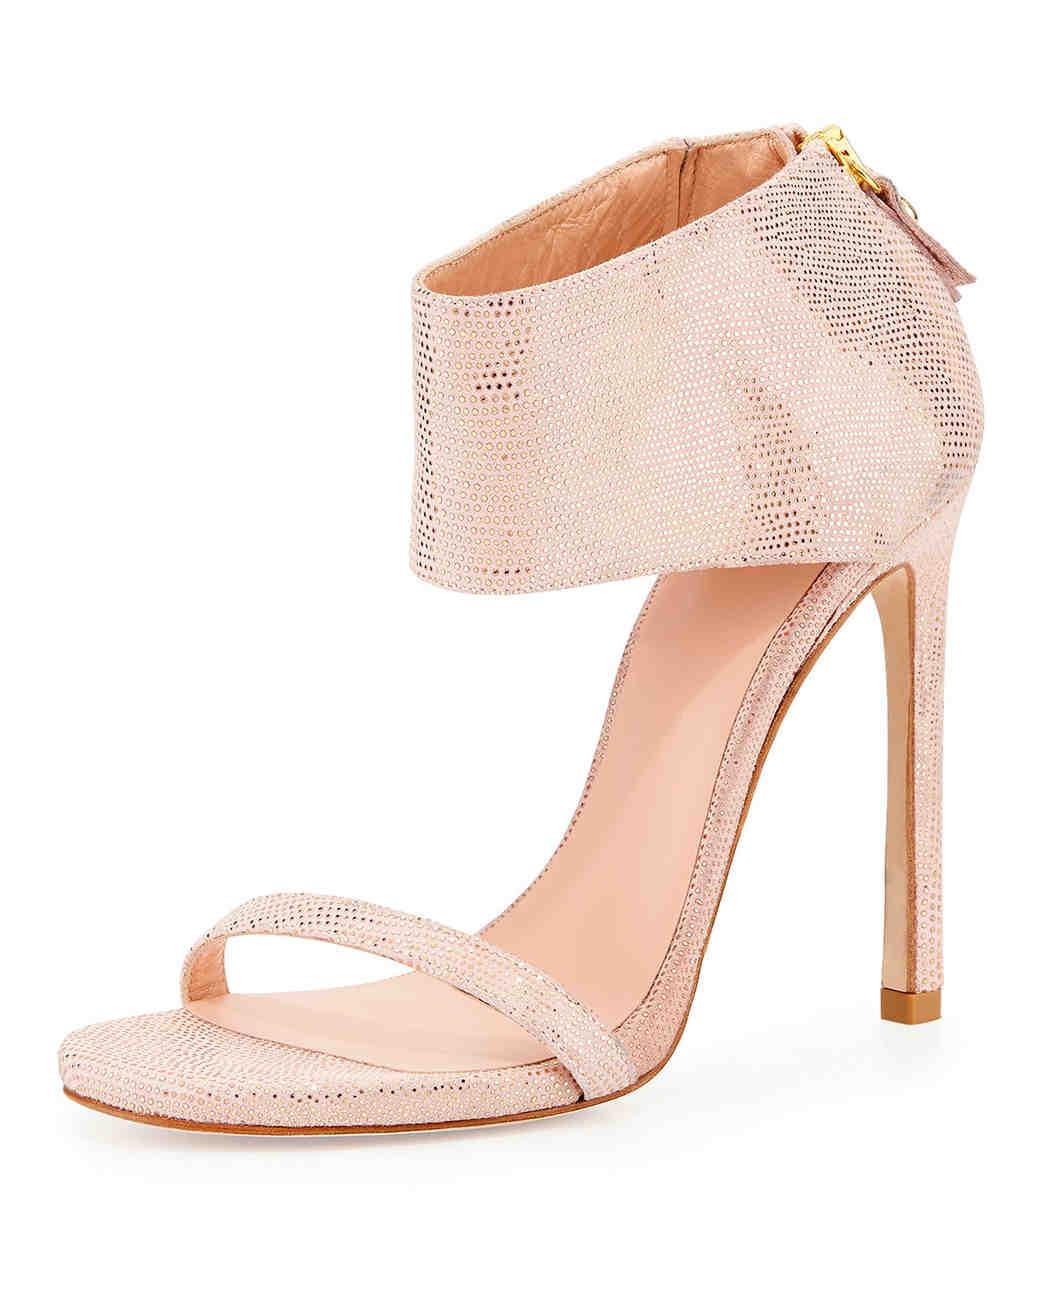 summer-wedding-shoes-stuart-weitzman-showgirl-sandal-0515.jpg